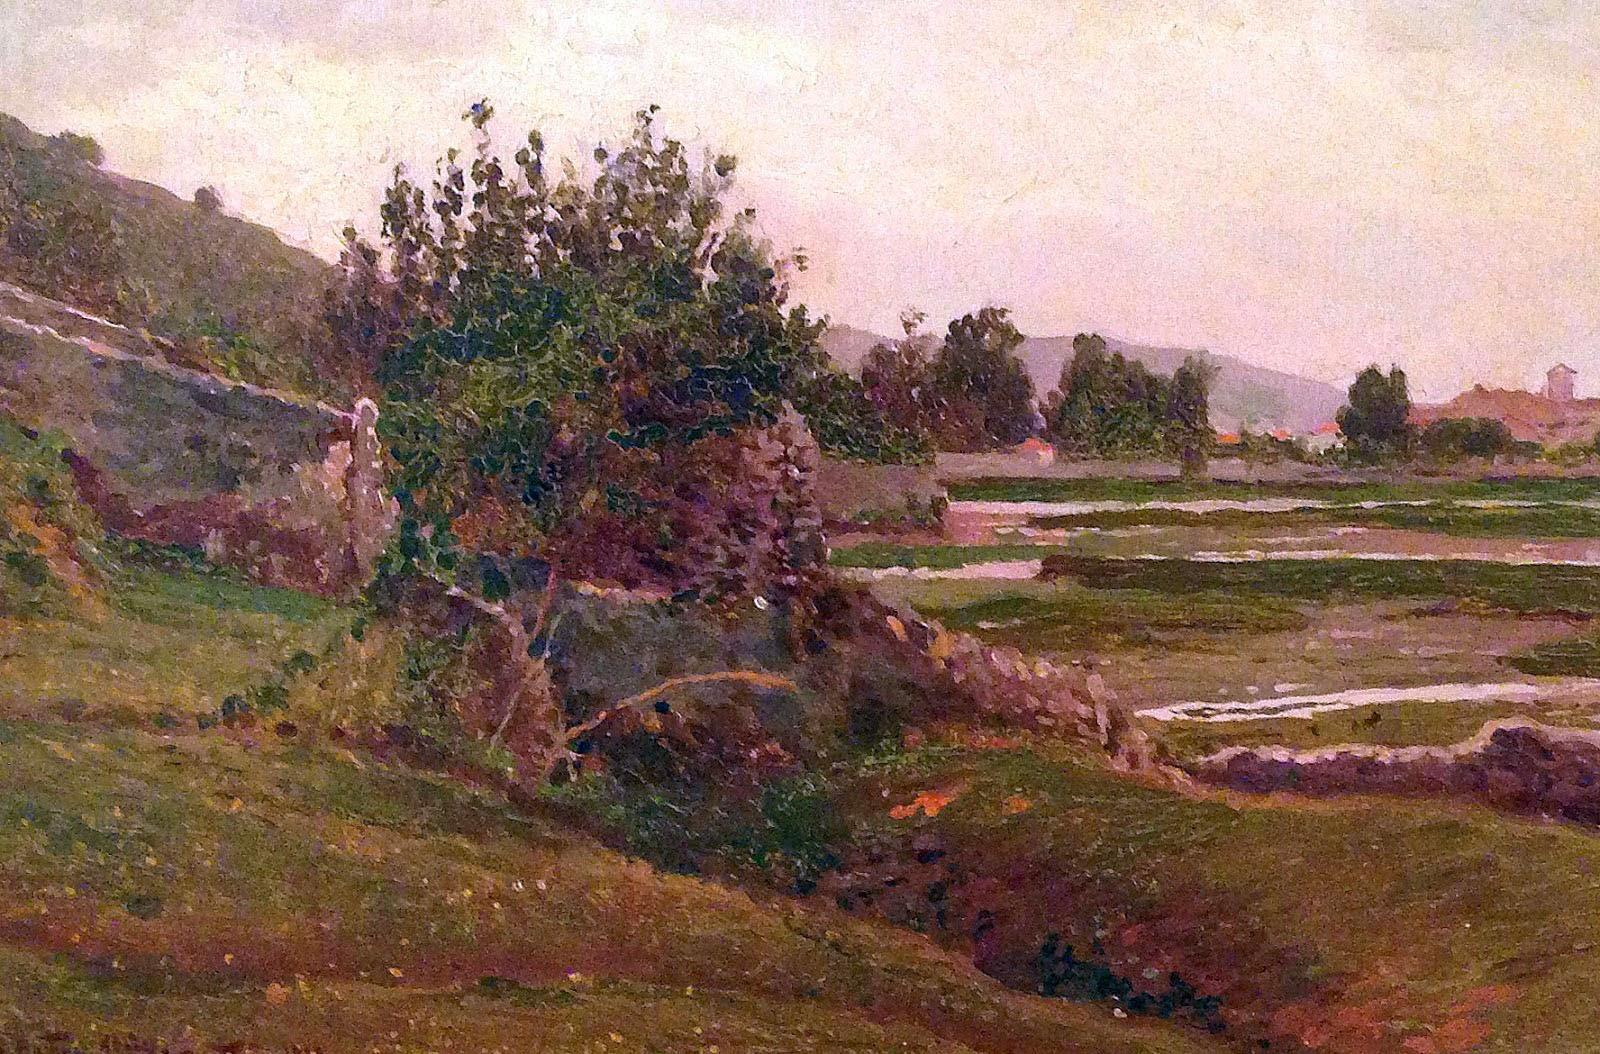 Pinturas de Juan Martínez Abades